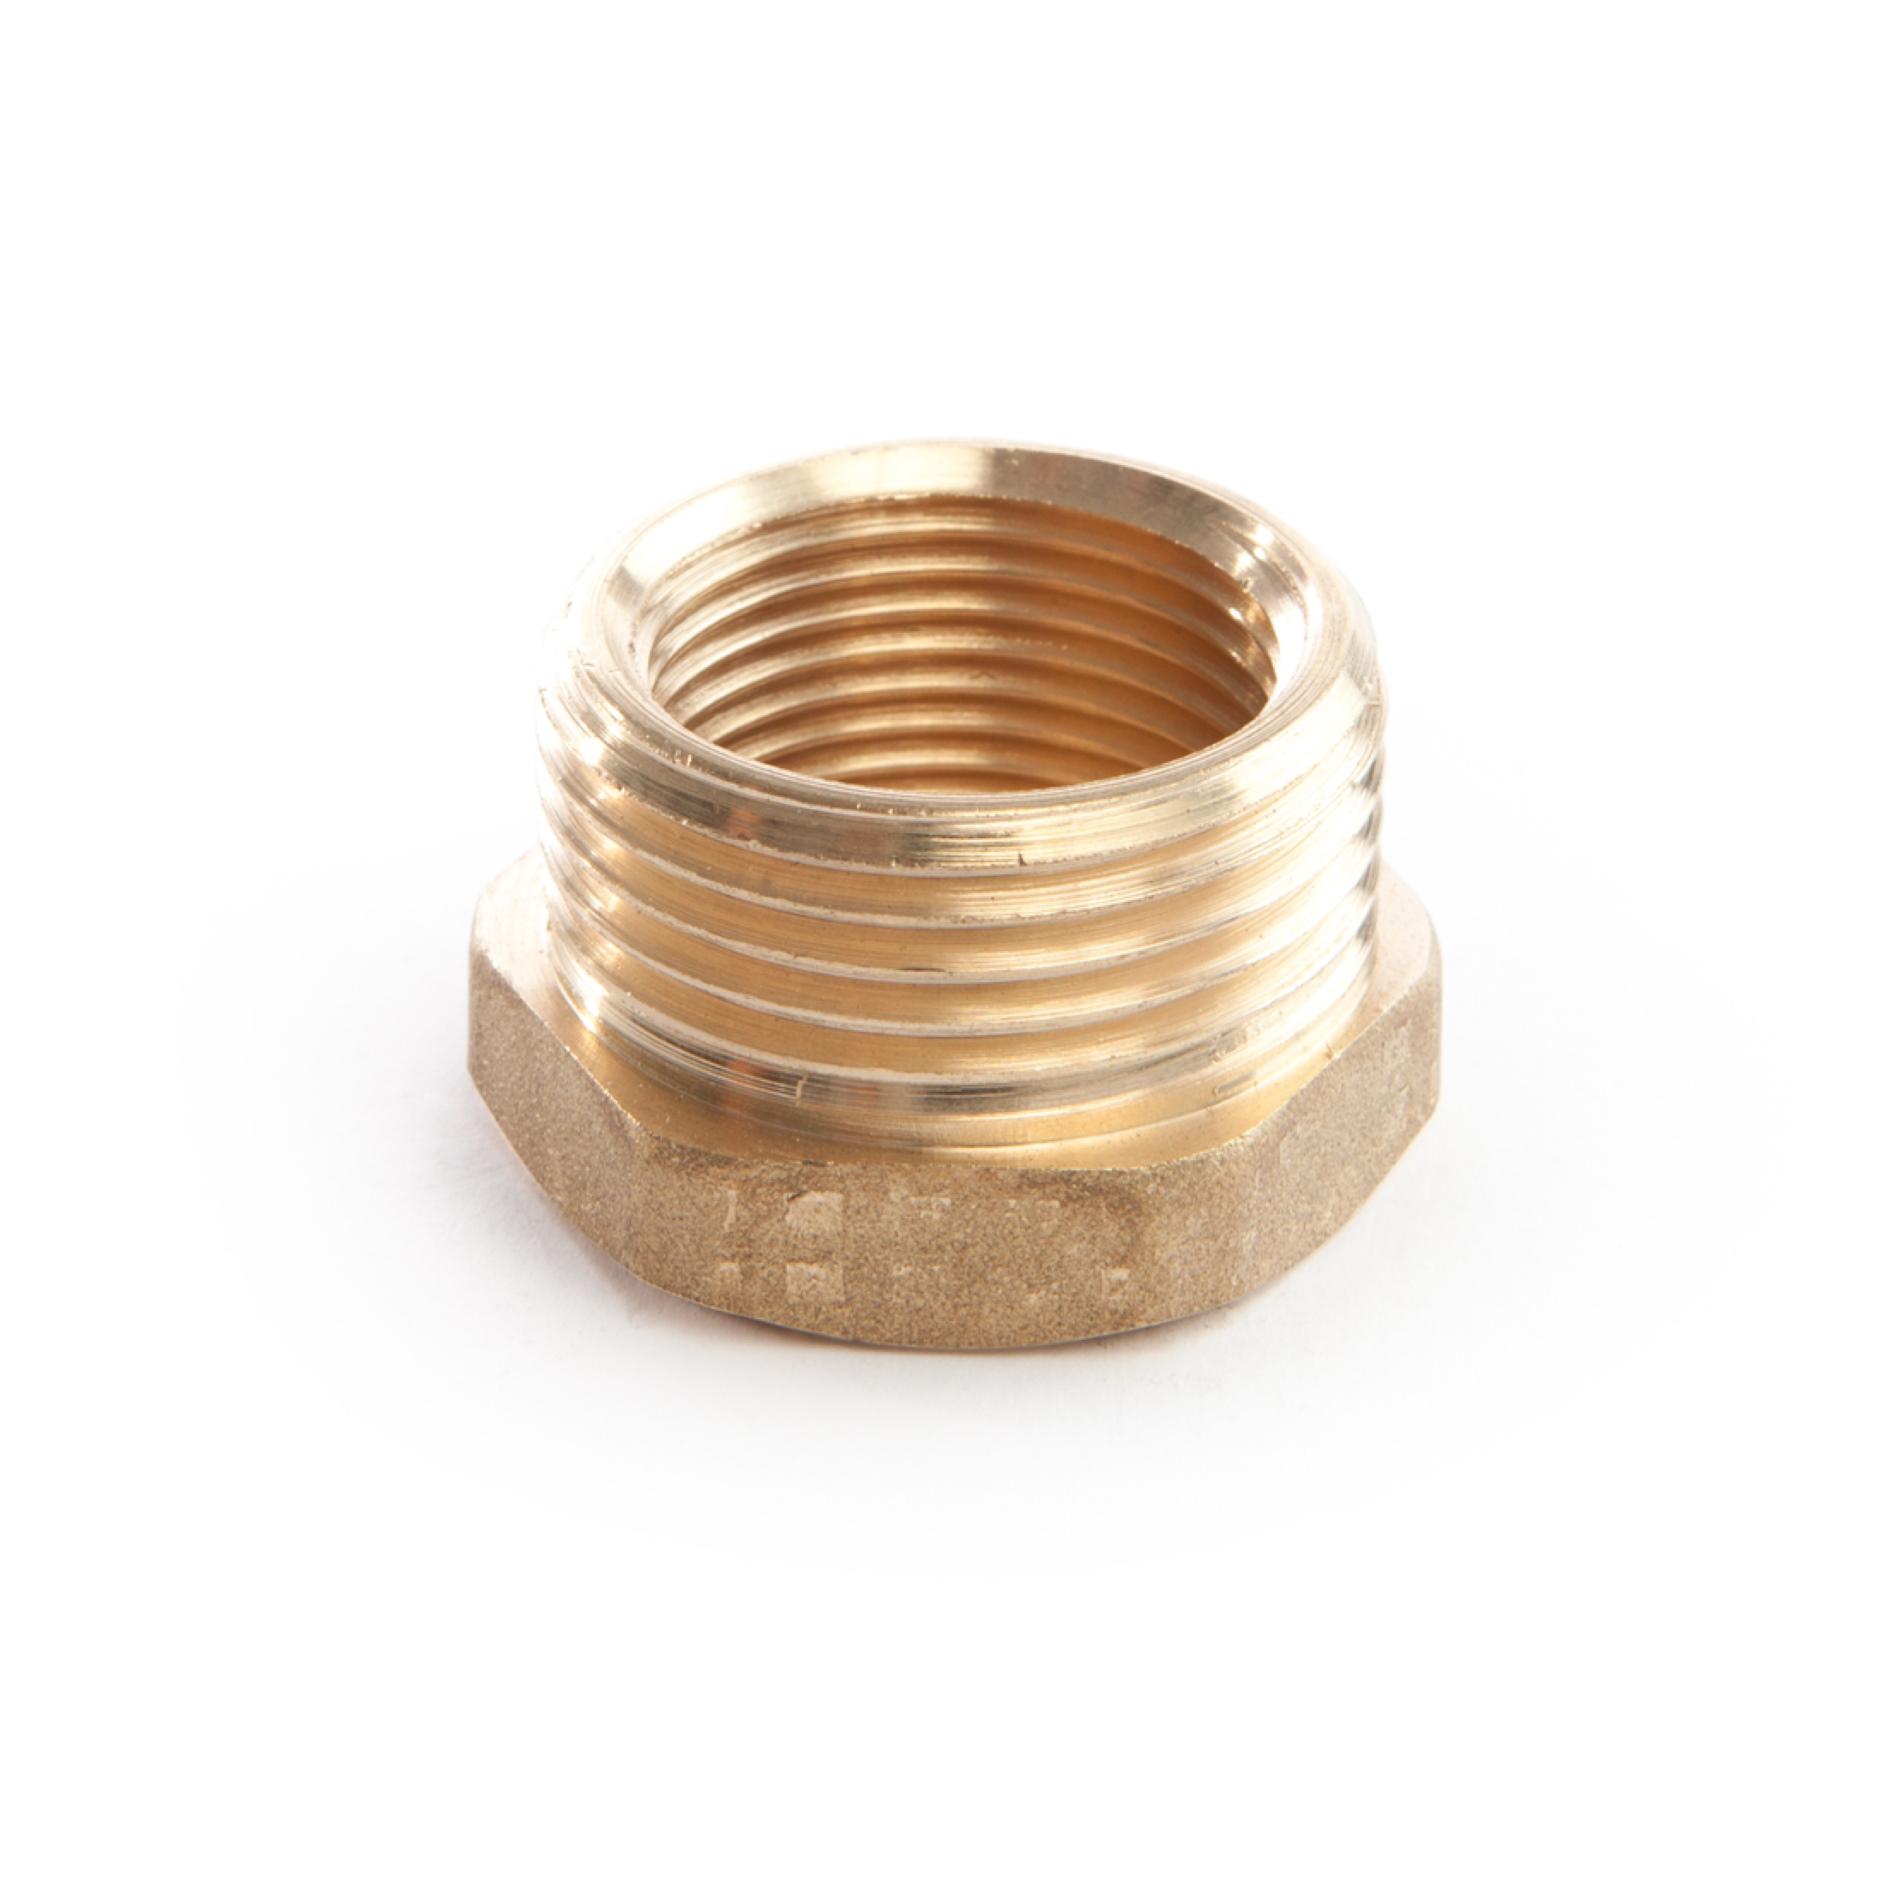 976 Riduzione esagonale MxF Hexagonal reducer ottone filettato brass threaded